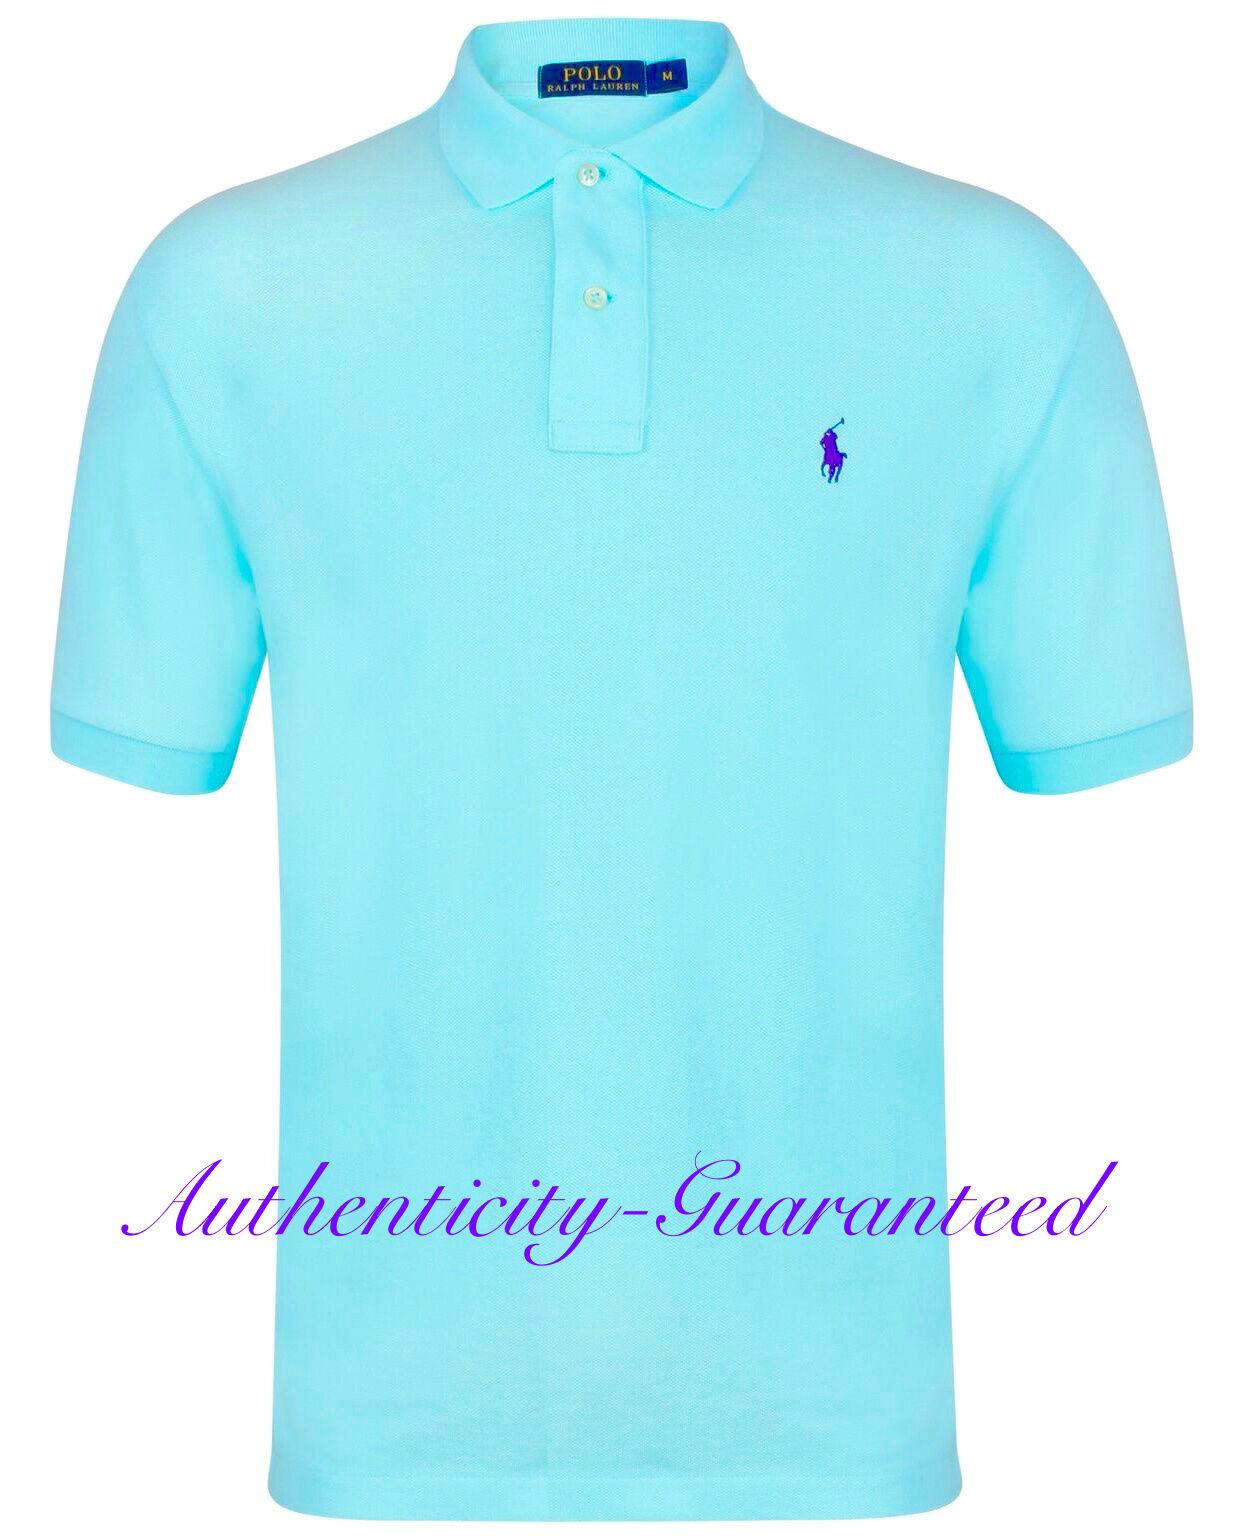 Ralph Lauren Mens Classic Fit Short Sleeve Polo Shirt Turquoise S - XXL RRP